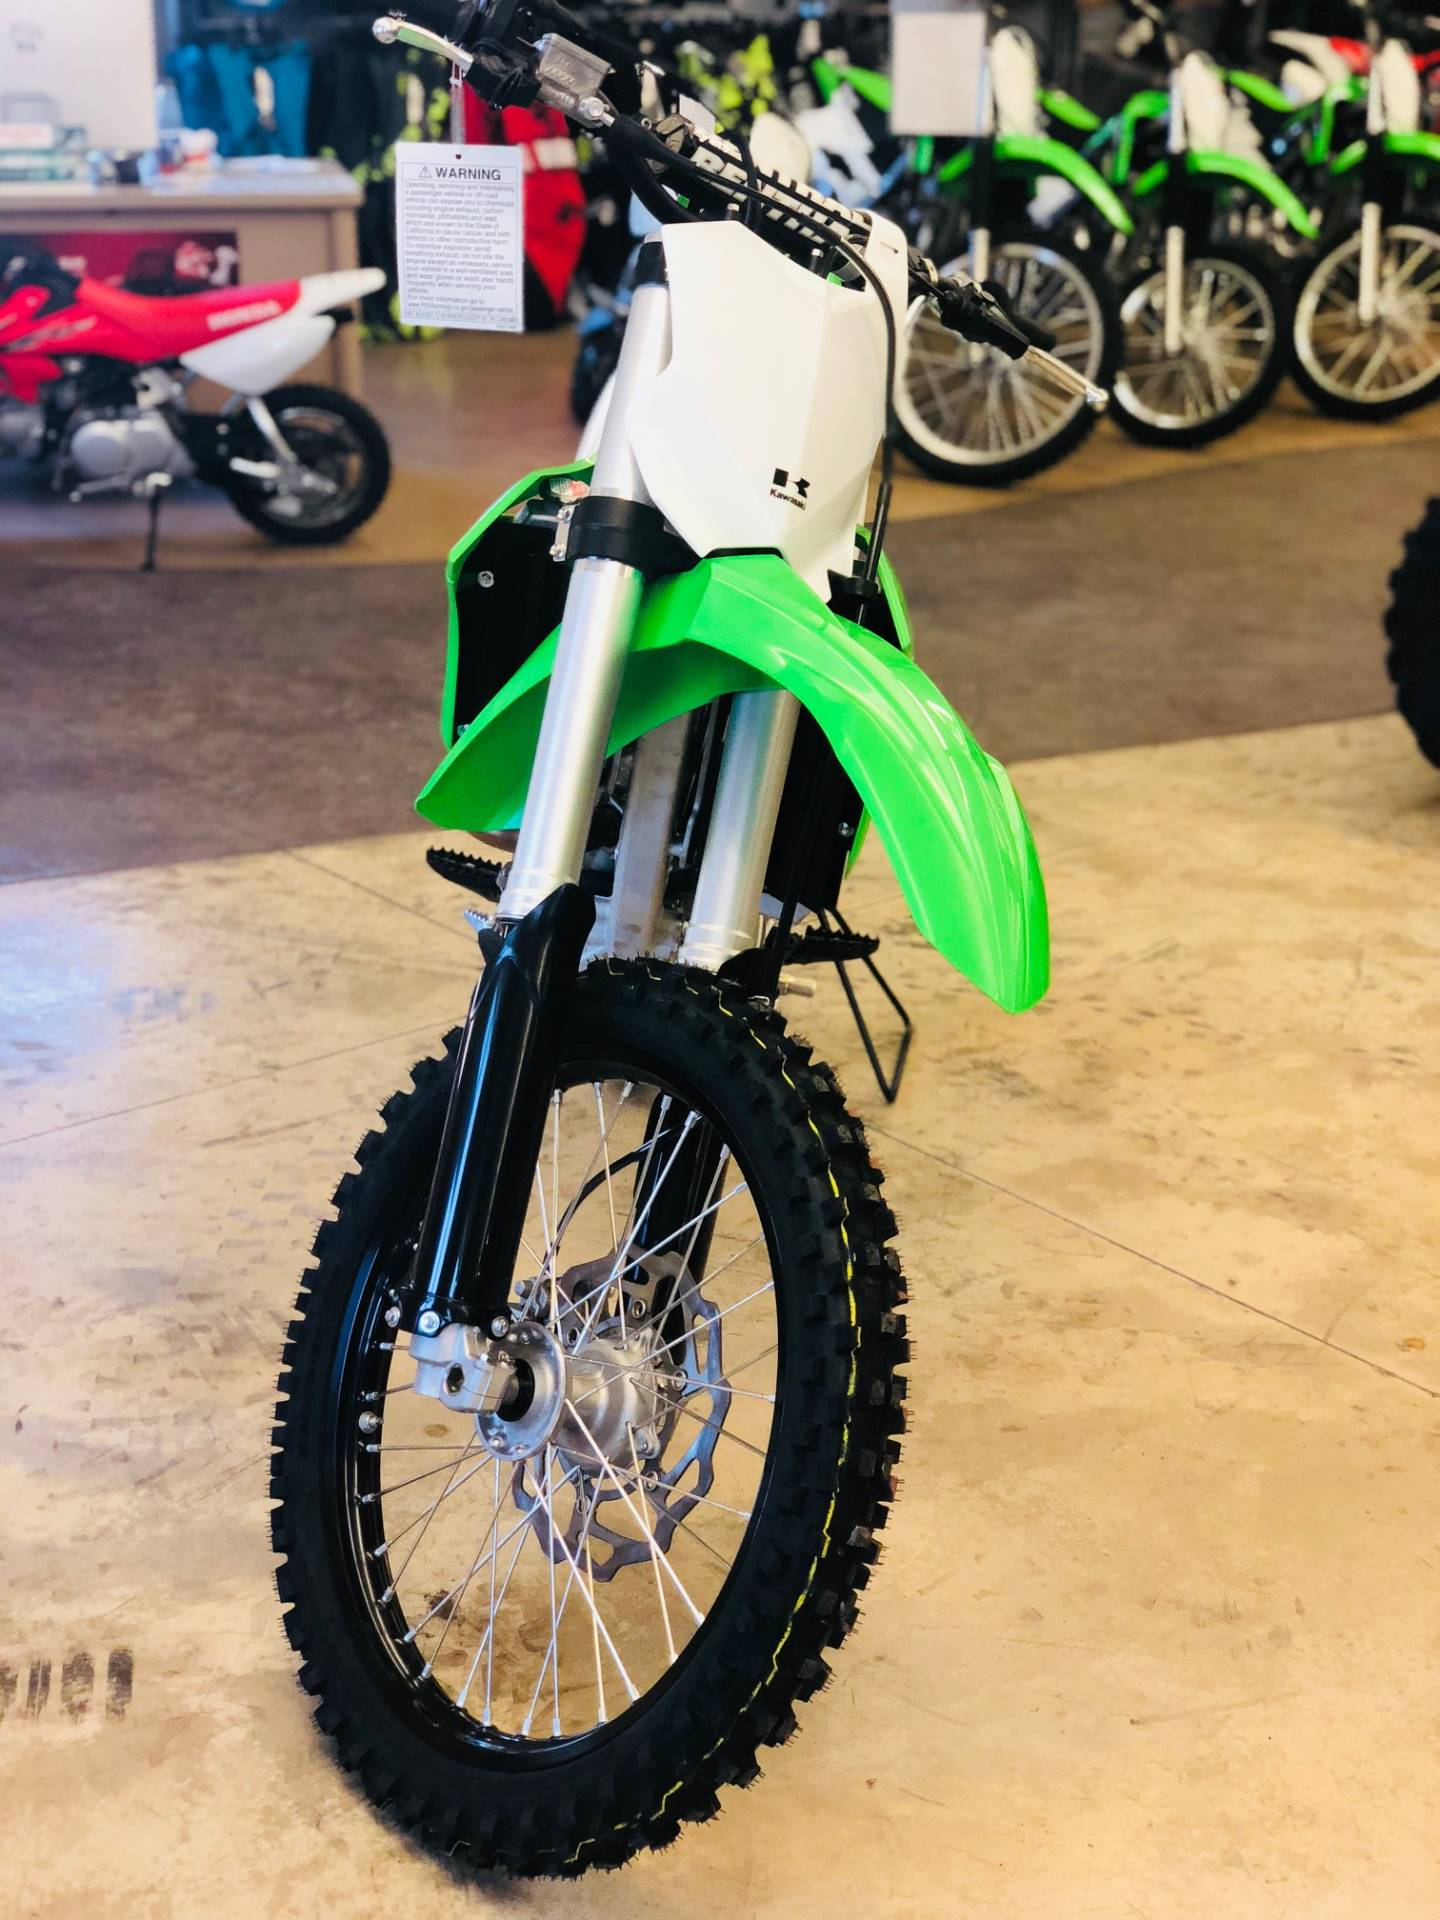 2019 Kawasaki Kx 250 Motorcycles Waterloo Iowa Kaw020284 Kx250 Wiring Harness In